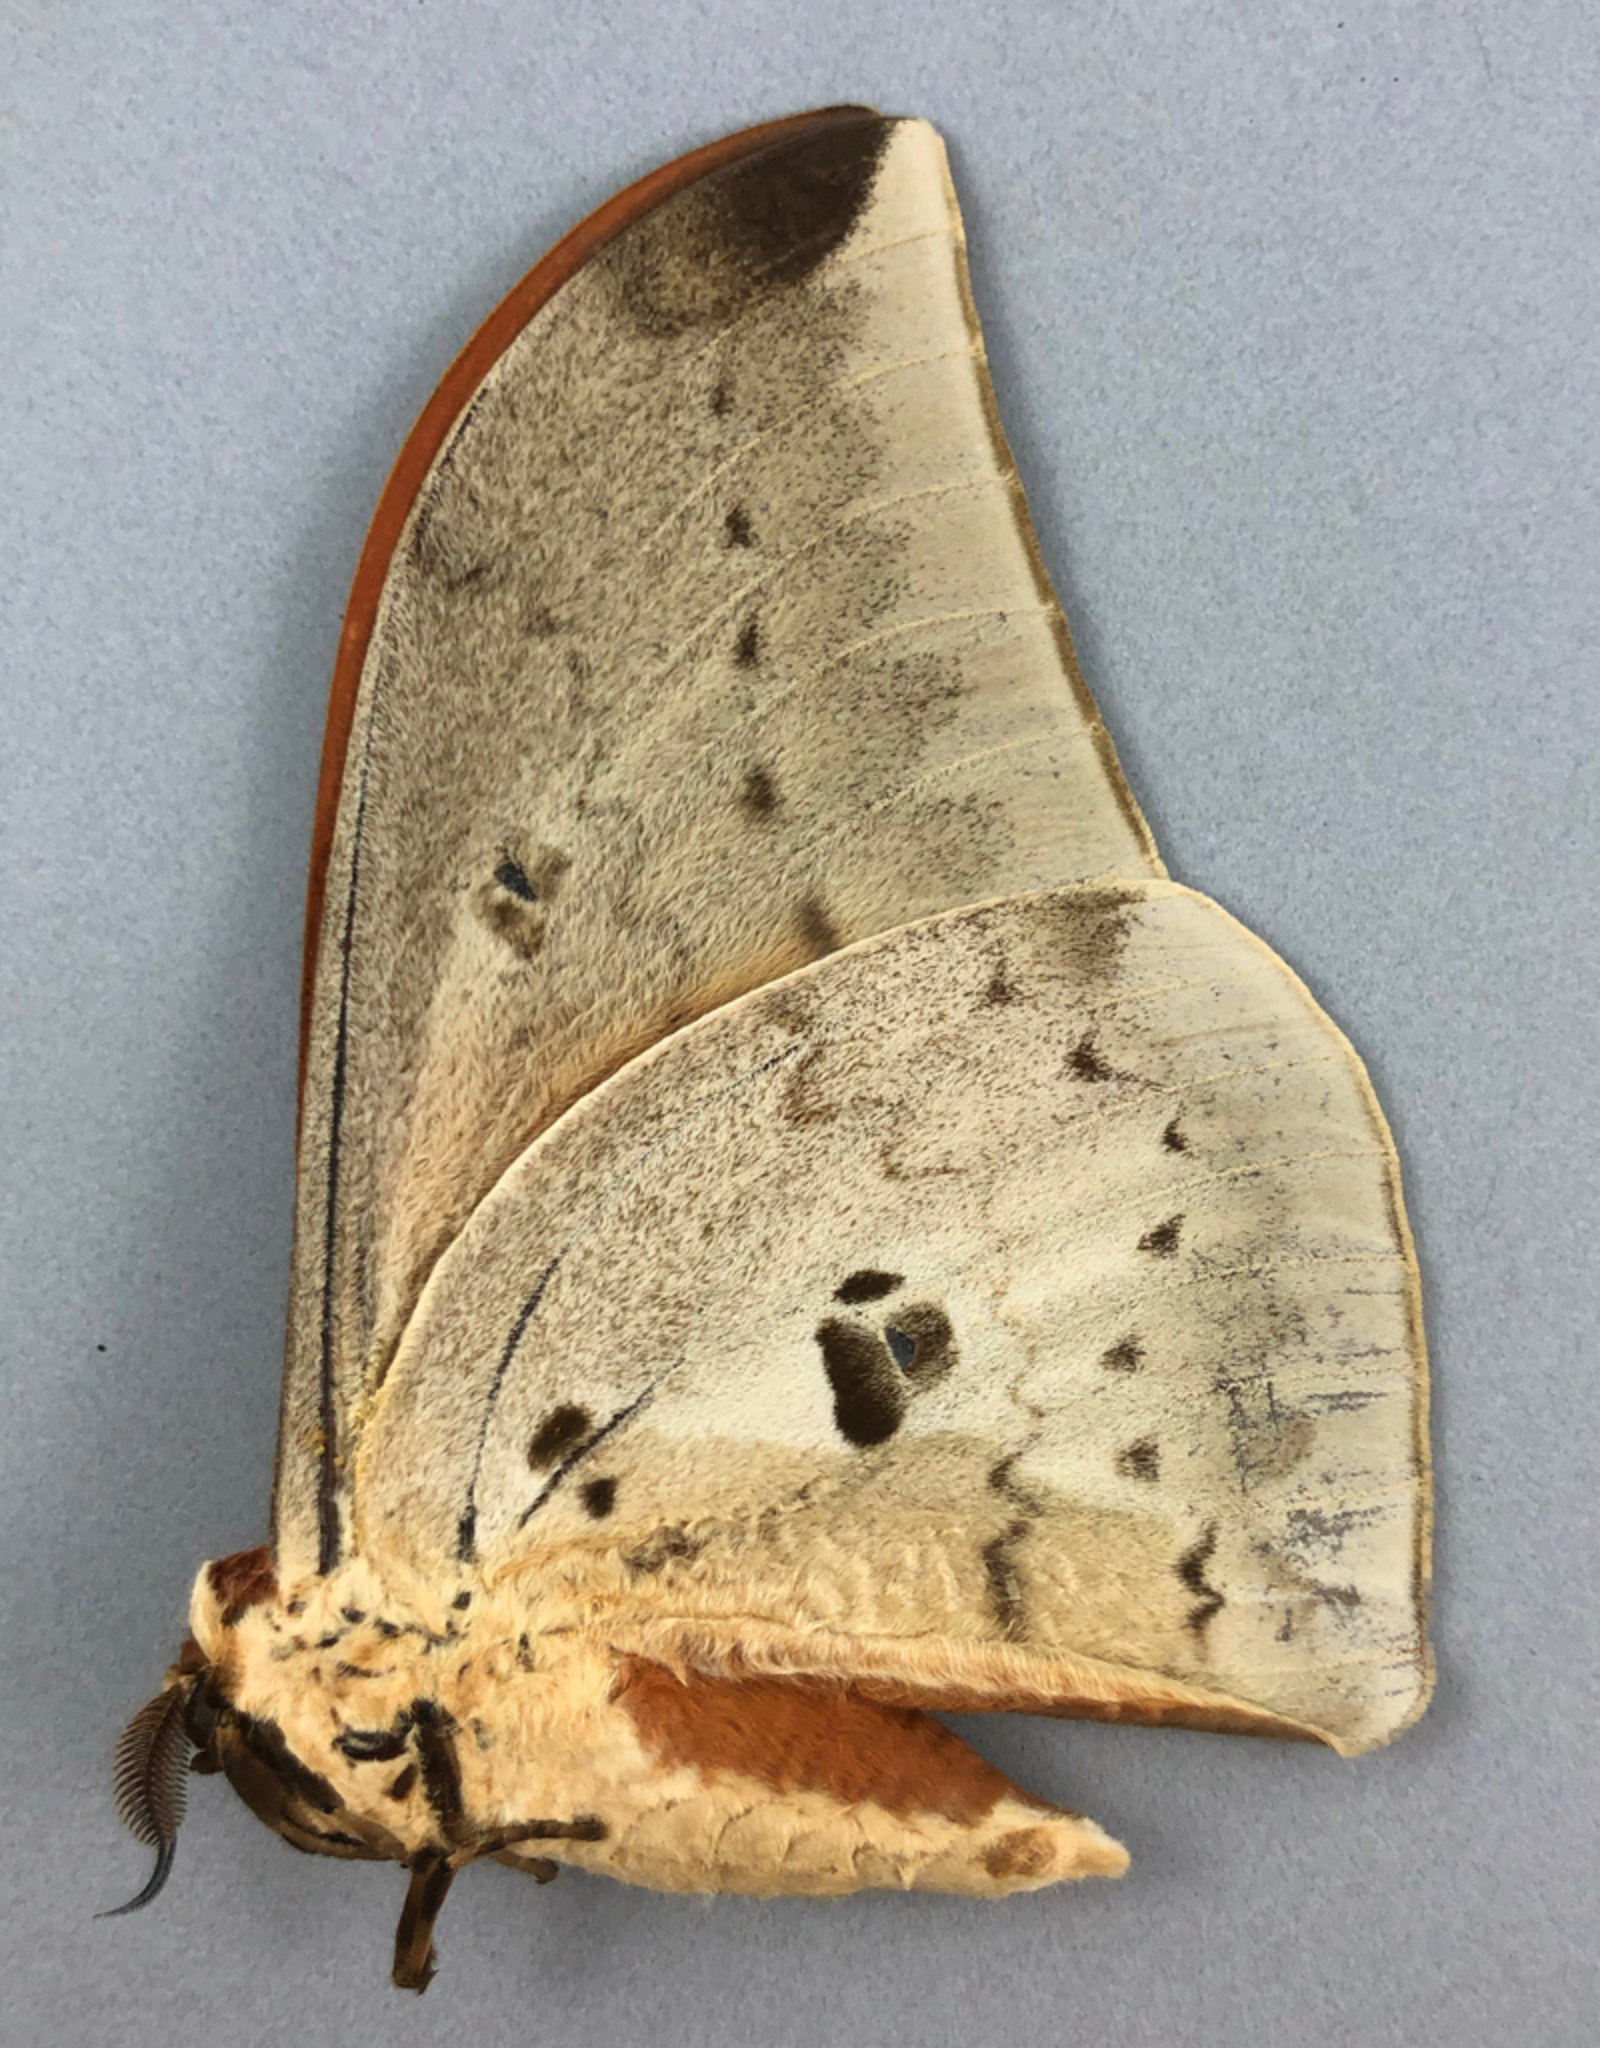 Pseudobunaea epithyrena M A1 Obout, Cameroon